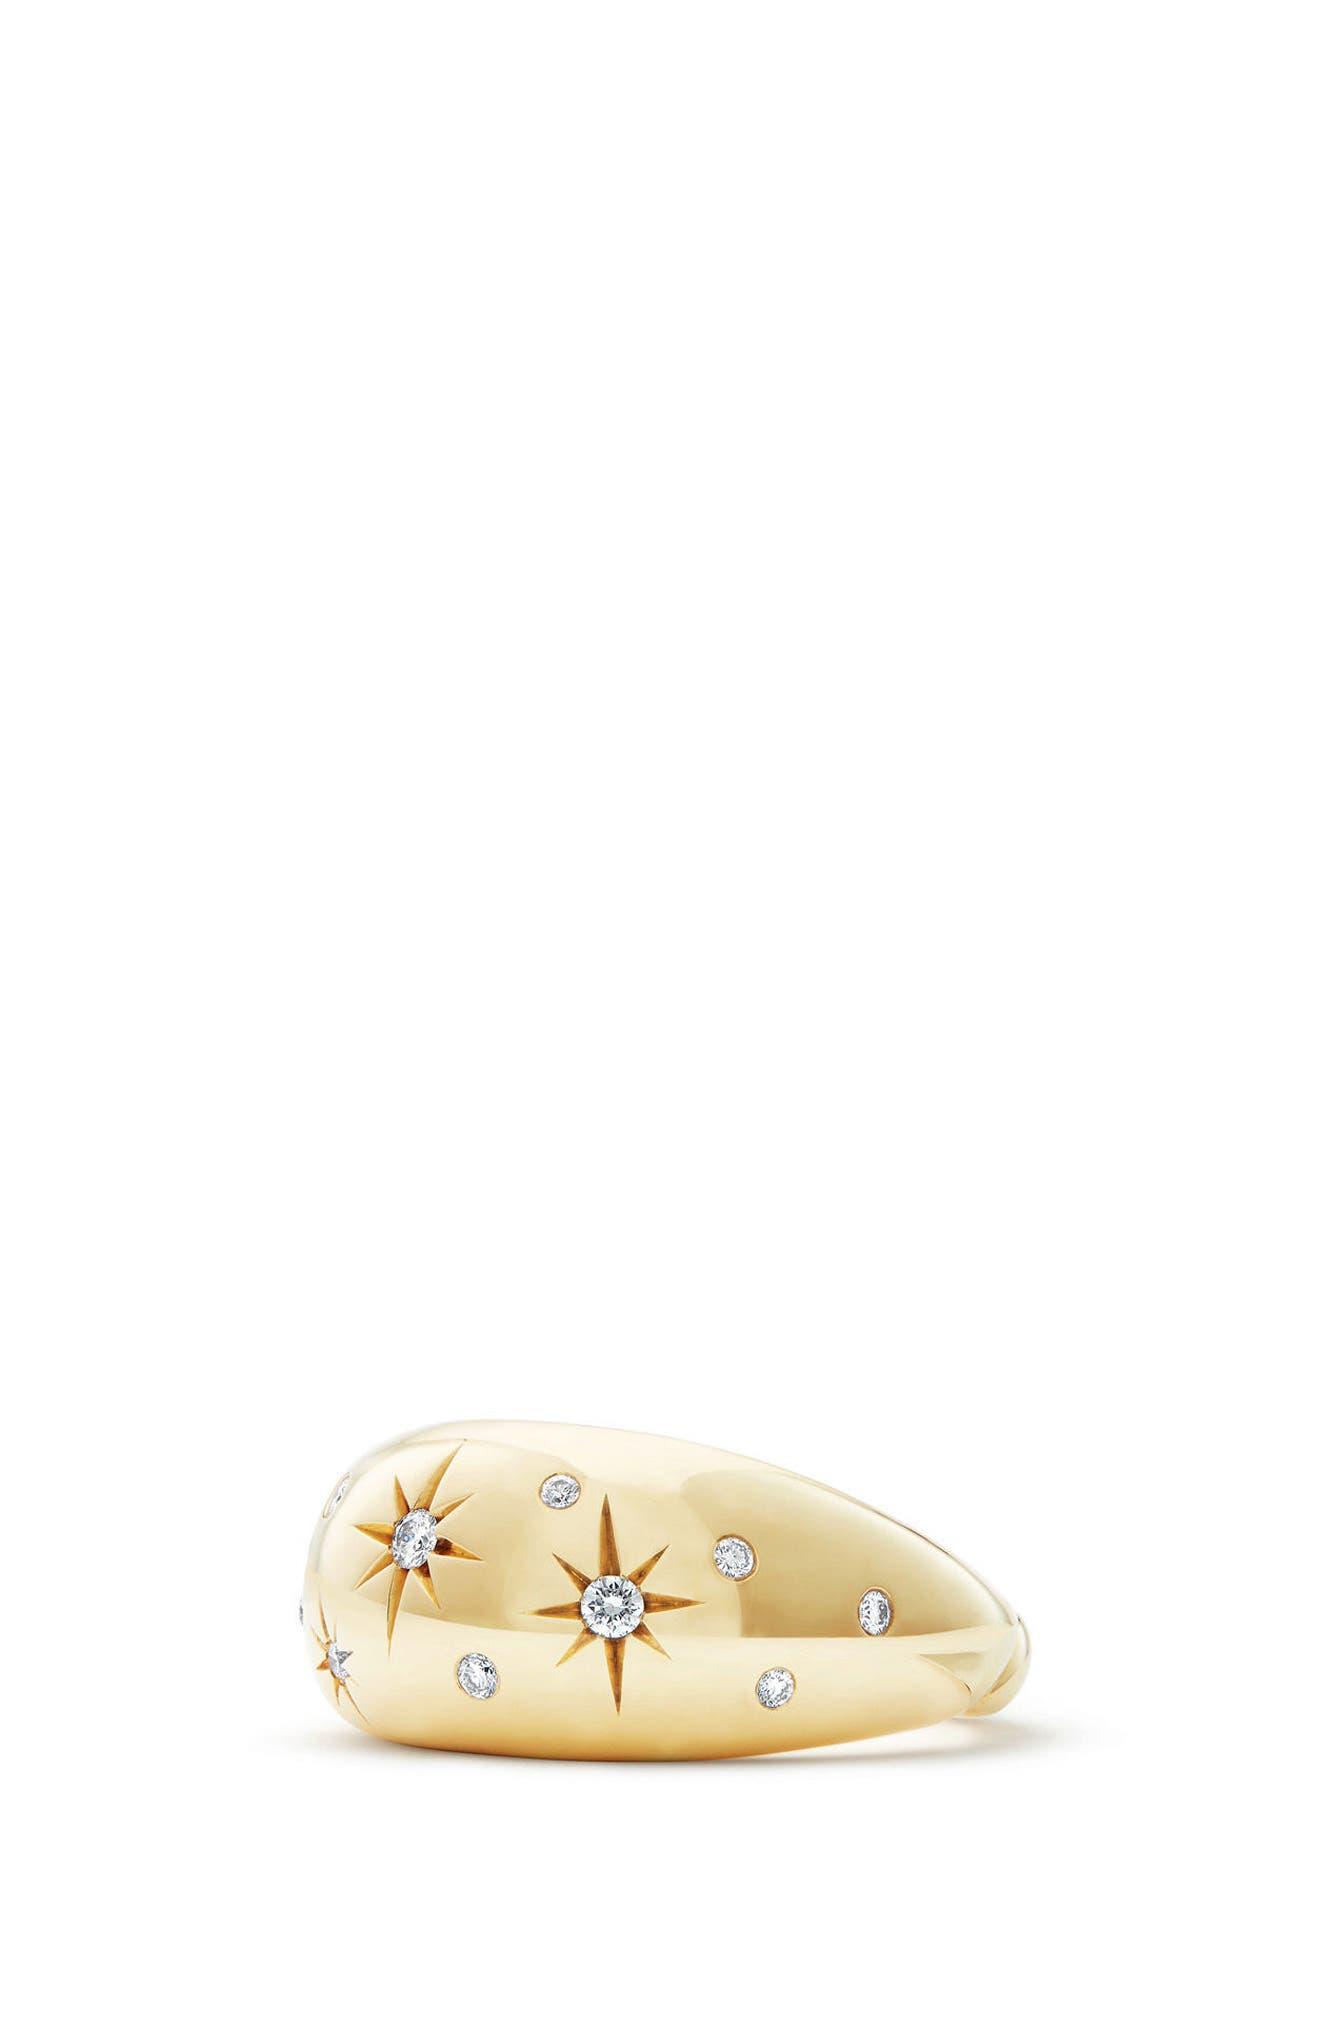 David Yurman Pure Form Ring with Diamonds in 18K Gold